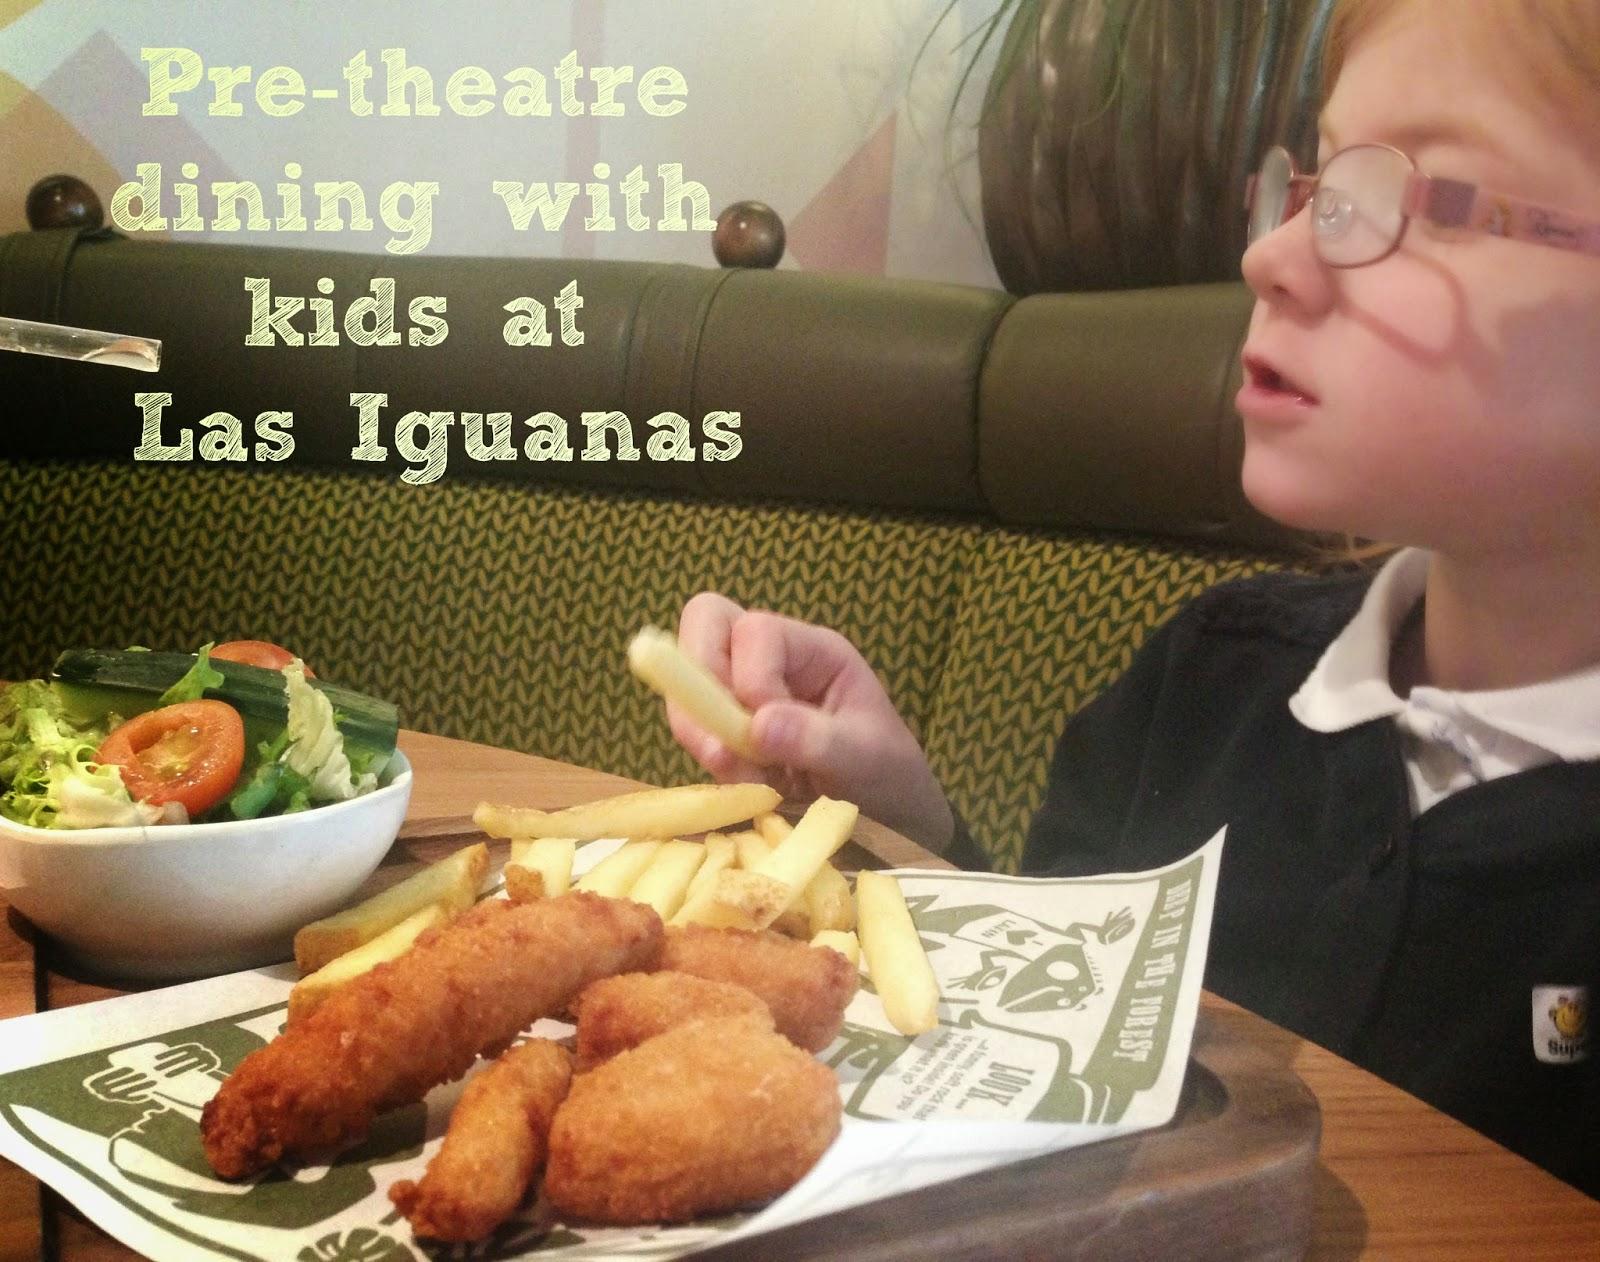 Top 10 Child Friendly Restaurants in Newcastle City Centre - Las Iguanas